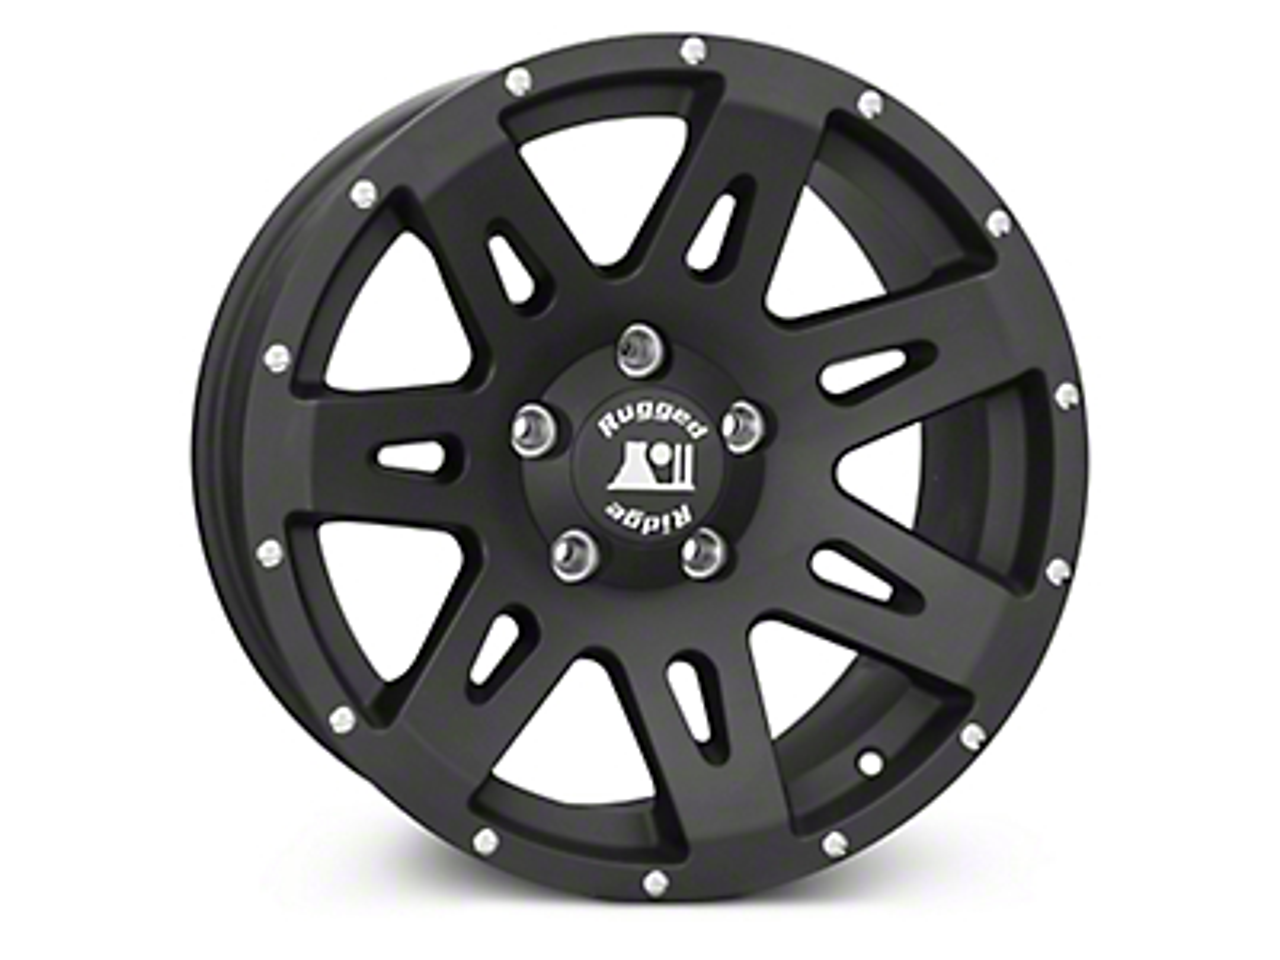 Rugged Ridge XHD Satin Black Wheels (07-18 Jeep Wrangler JK; 2018 Jeep Wrangler JL)